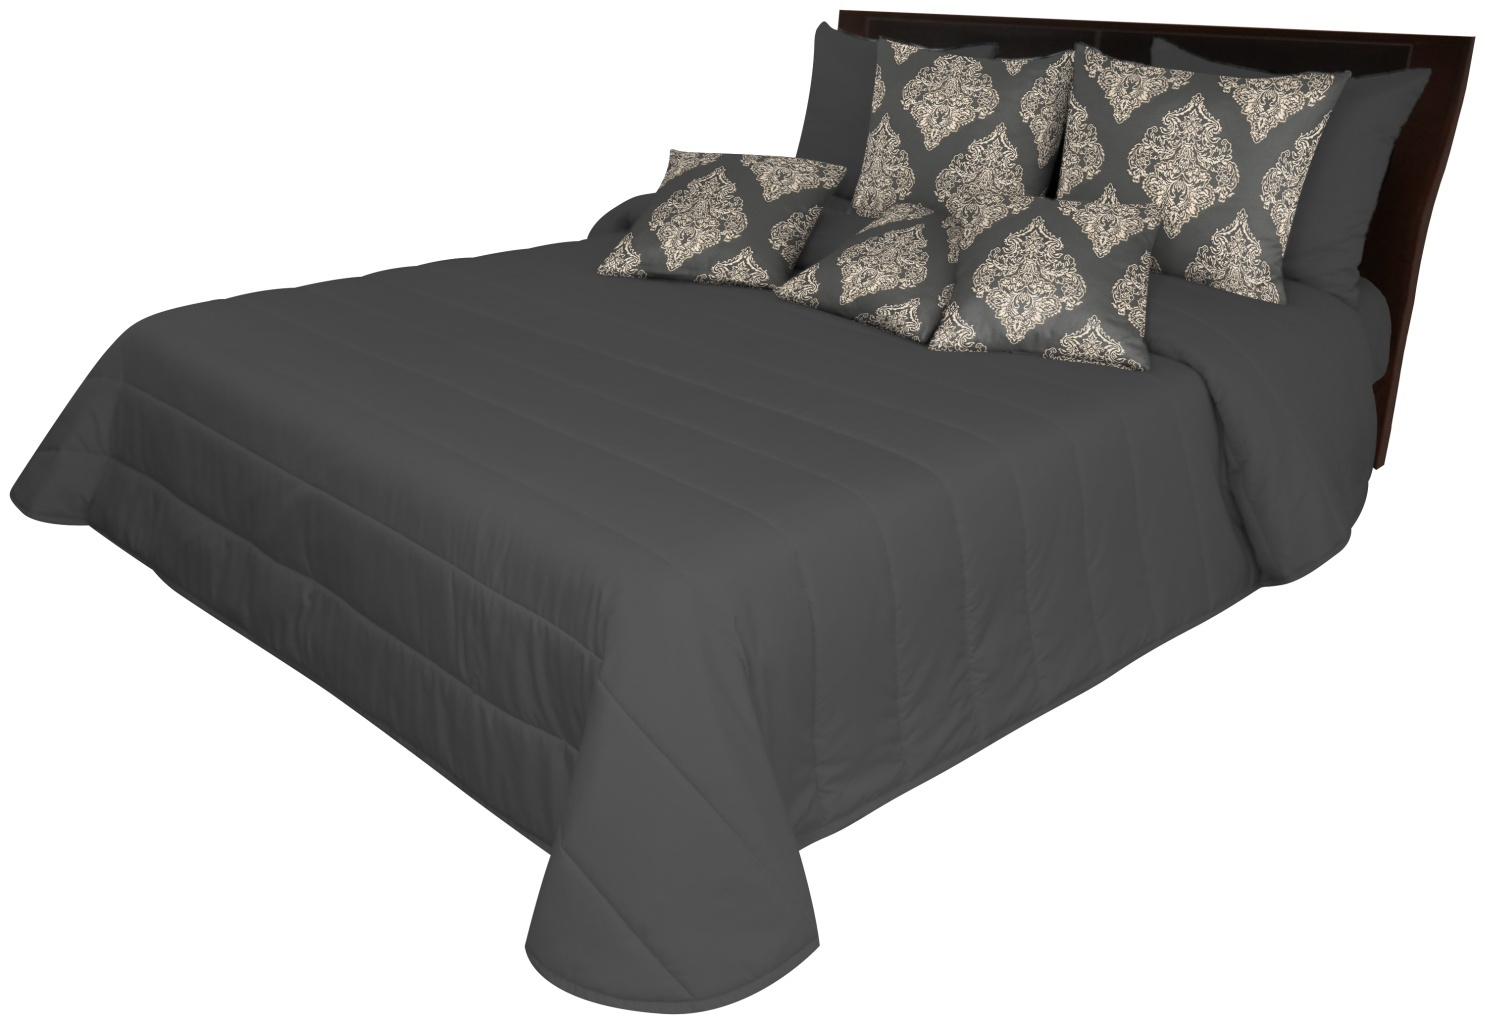 Narzuta pikowana na łóżko NMF-02 Mariall